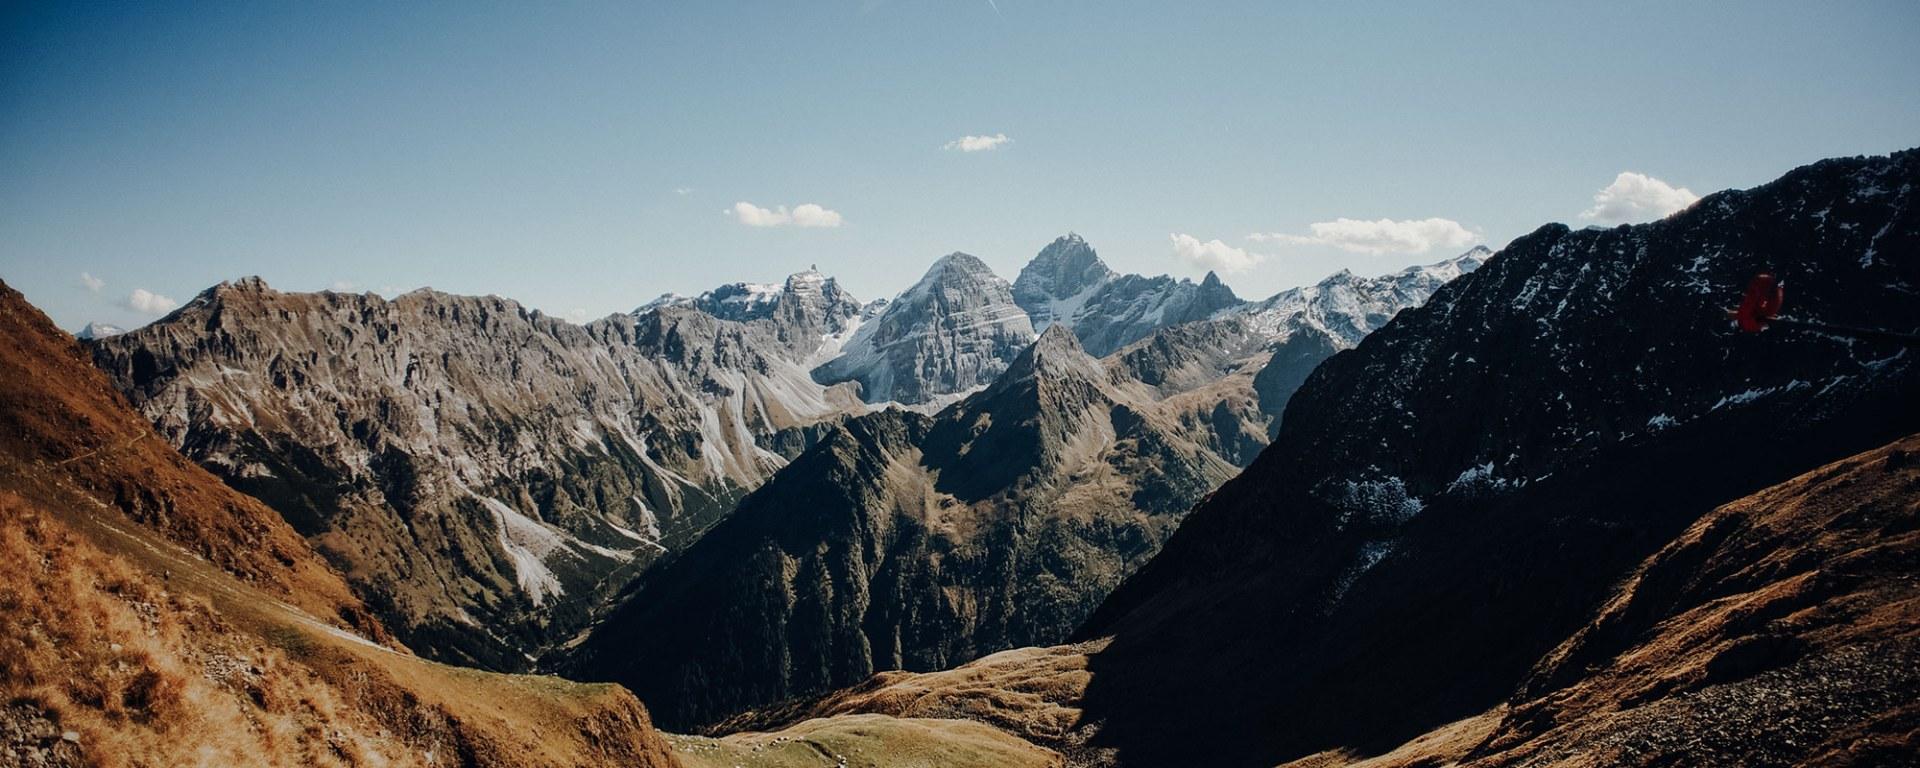 Herbstliche Berglandschaft in Tirol